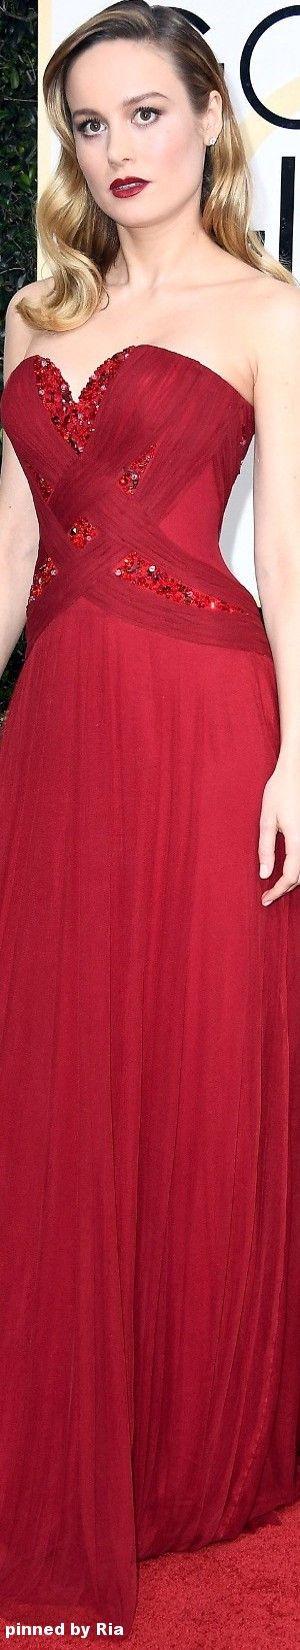 Brie Larson in Rodarte l The 2017 Golden Globe Awards l Ria